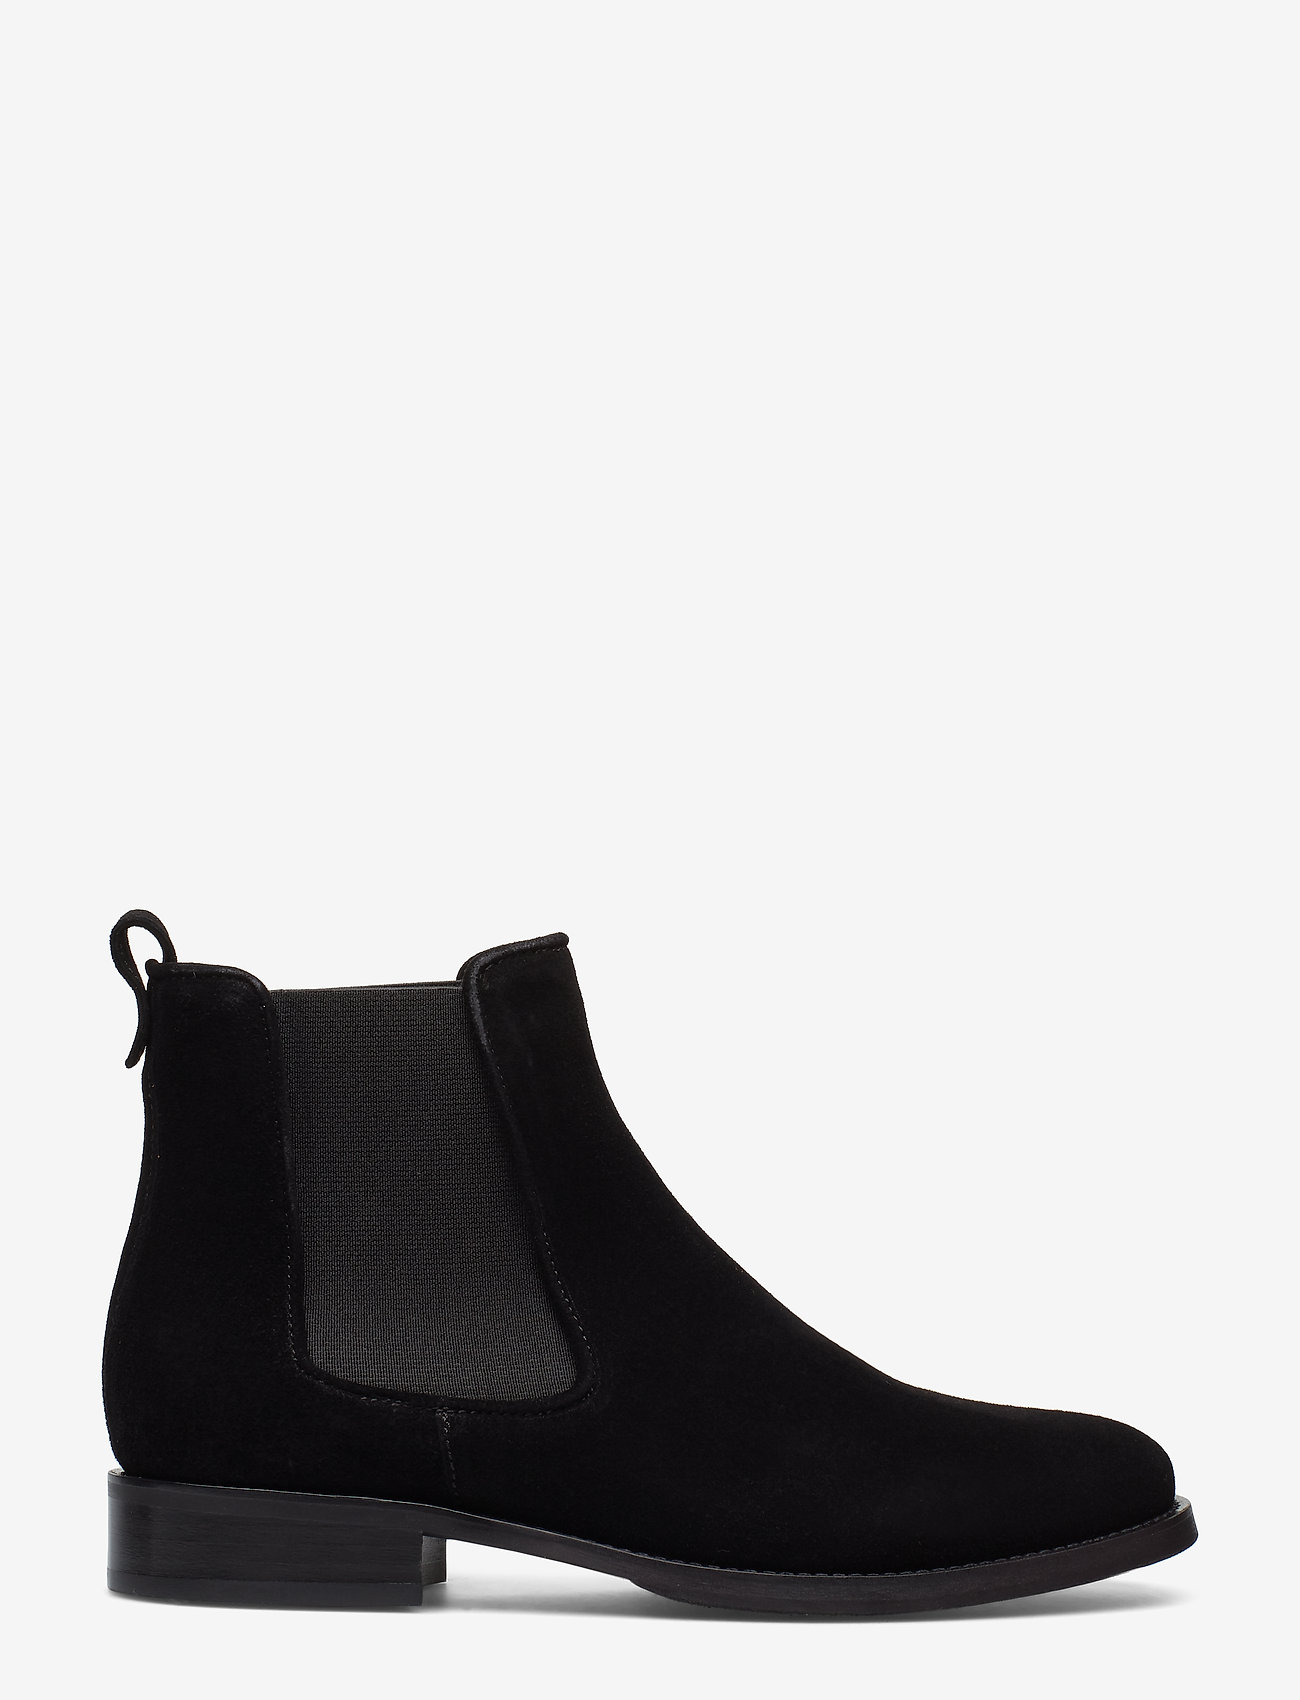 Billi Bi - Boots 7913 - chelsea boots - black suede 50 p - 1